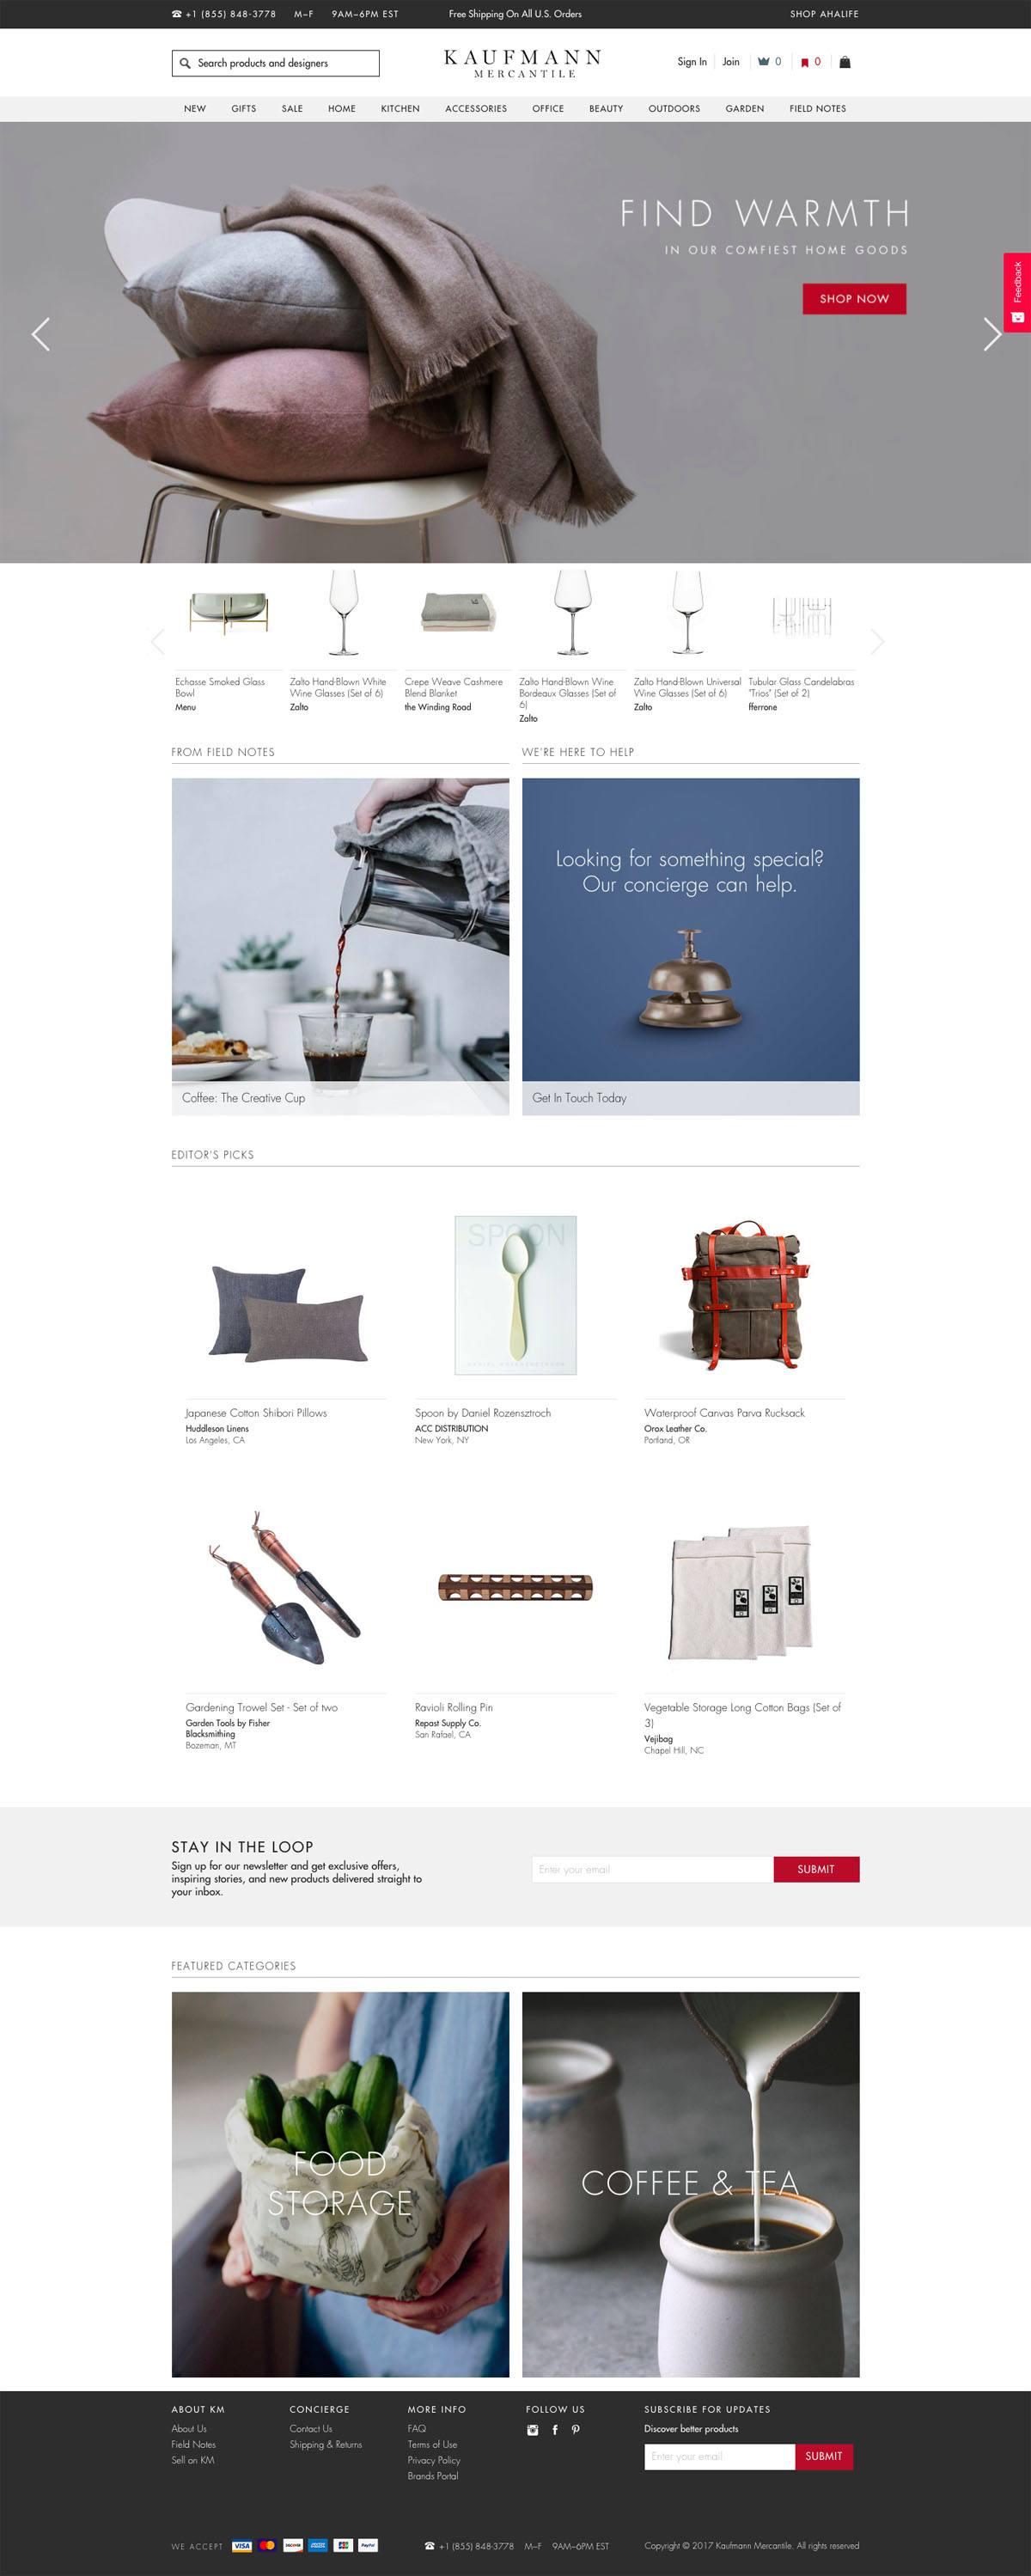 eCommerce website: Kaufmann Mercantile